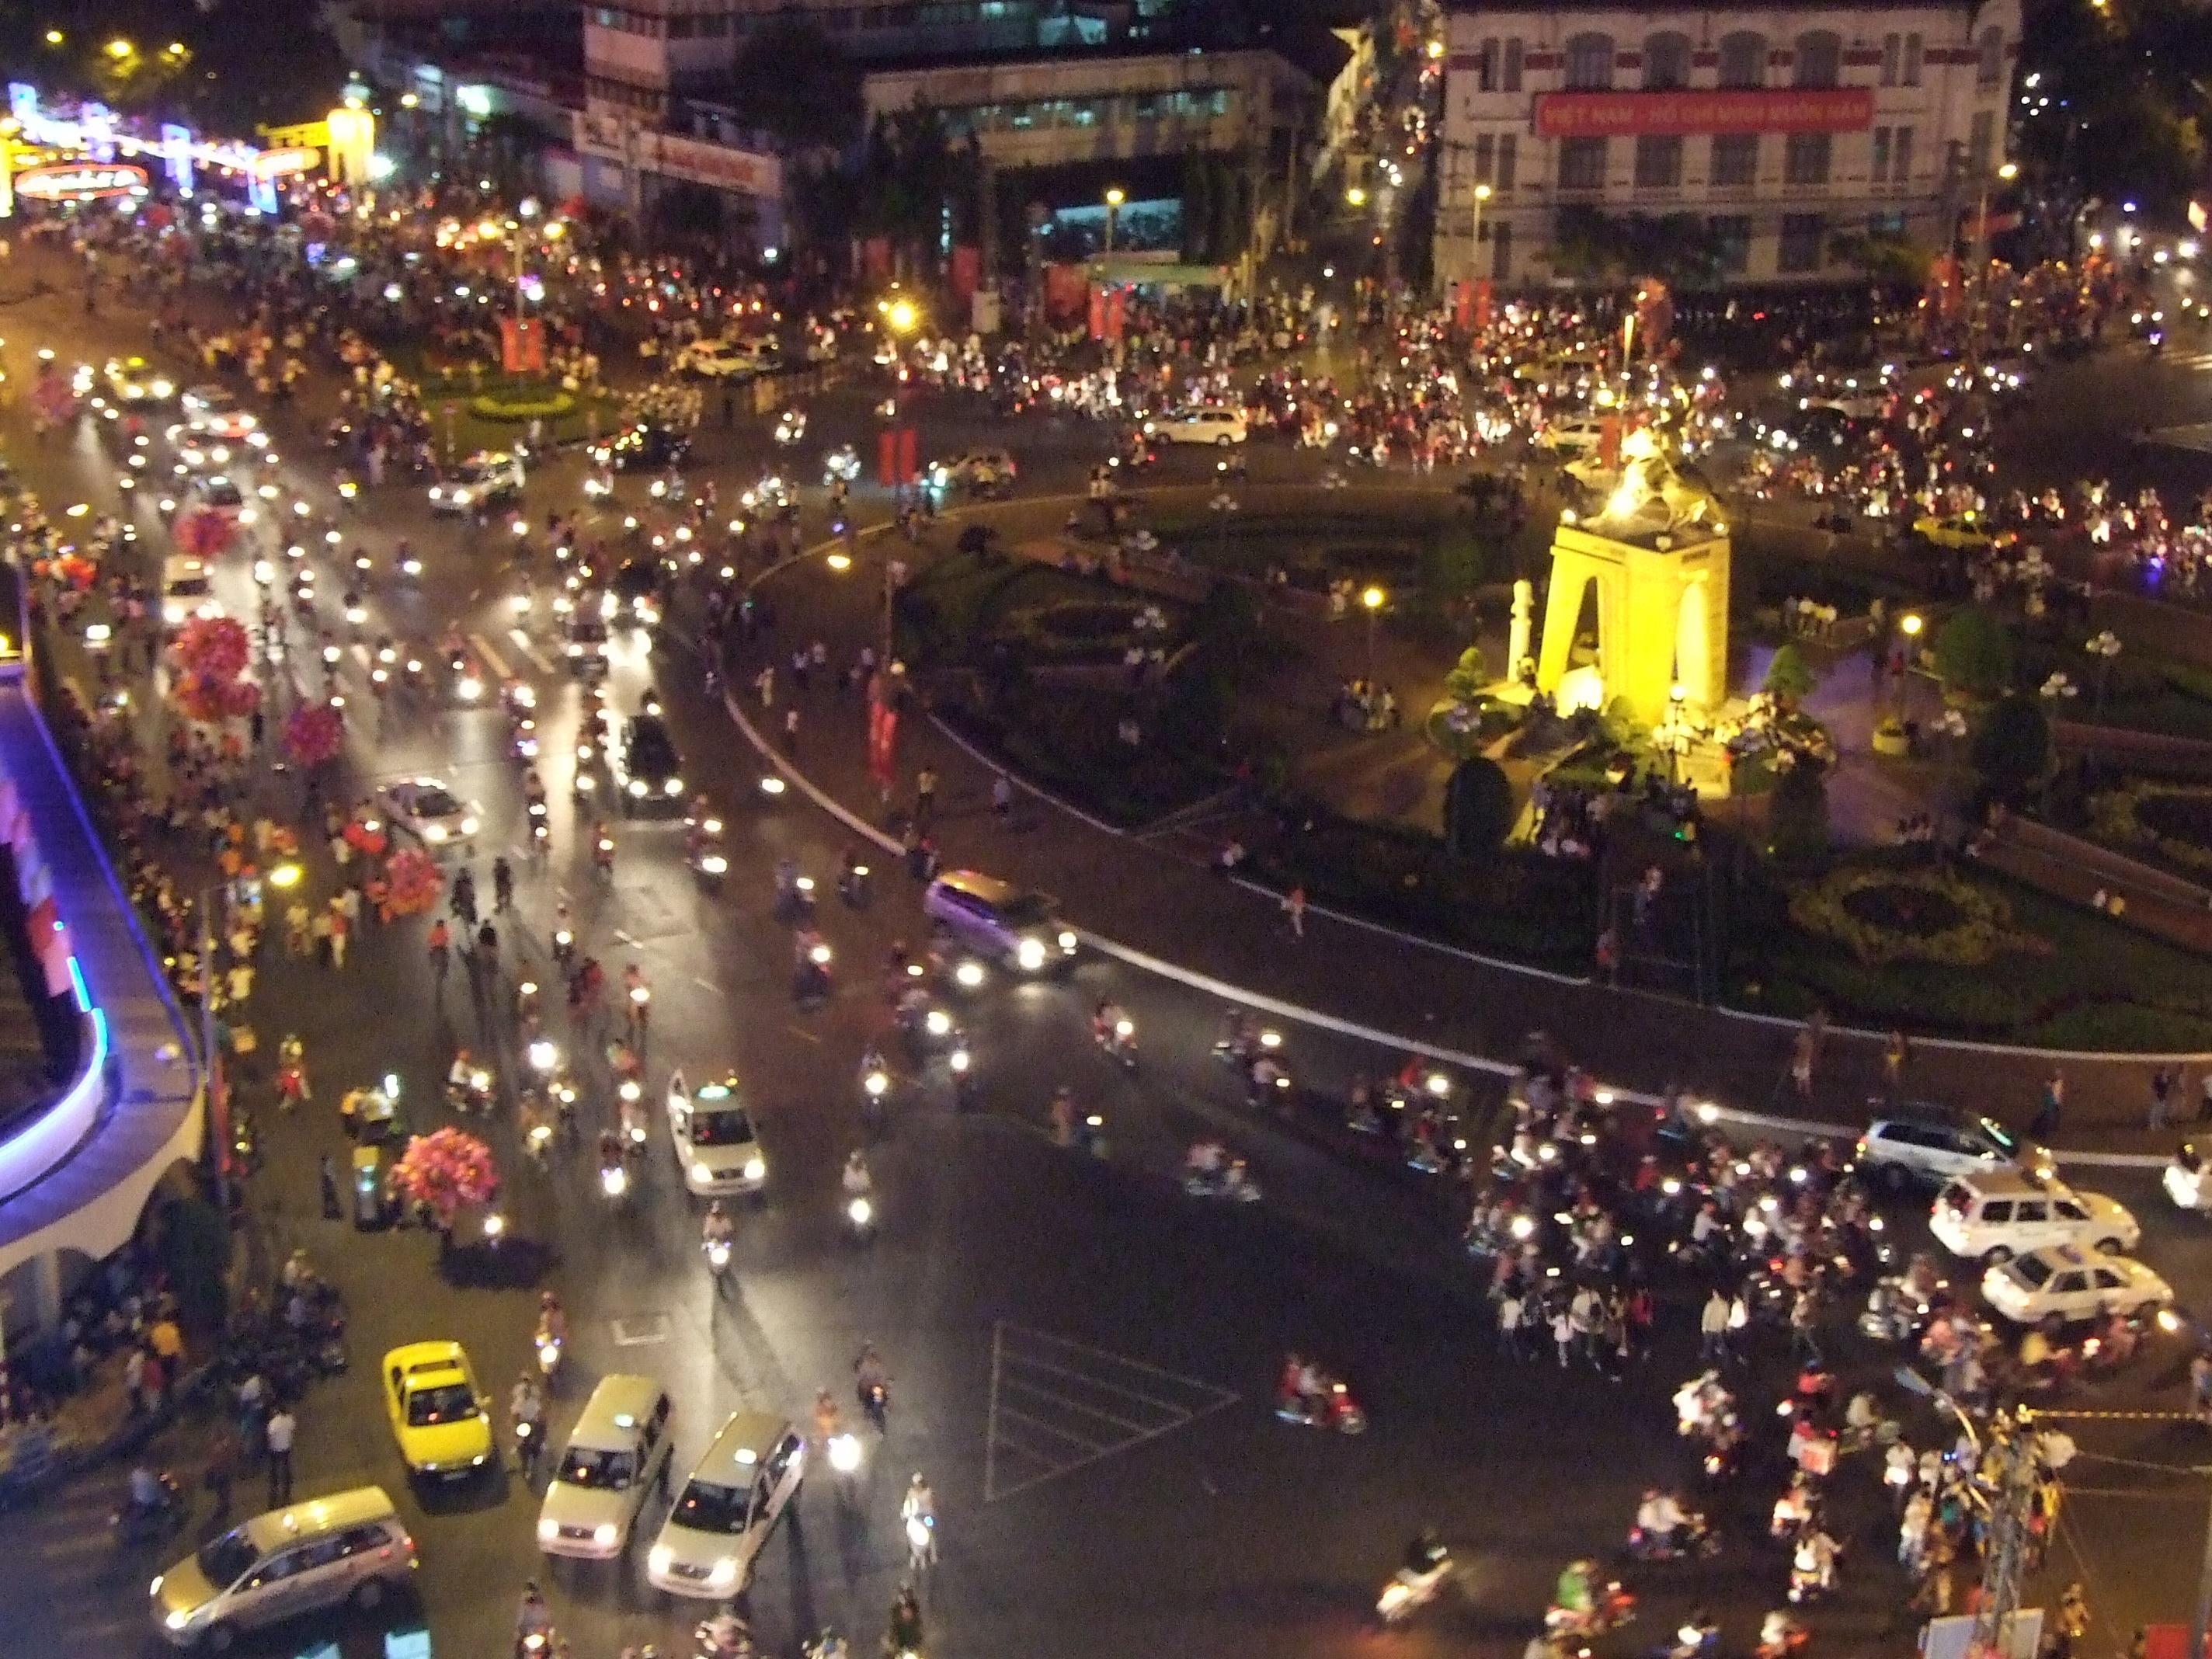 http://upload.wikimedia.org/wikipedia/commons/3/36/Saigon,_fête_du_Têt.jpg